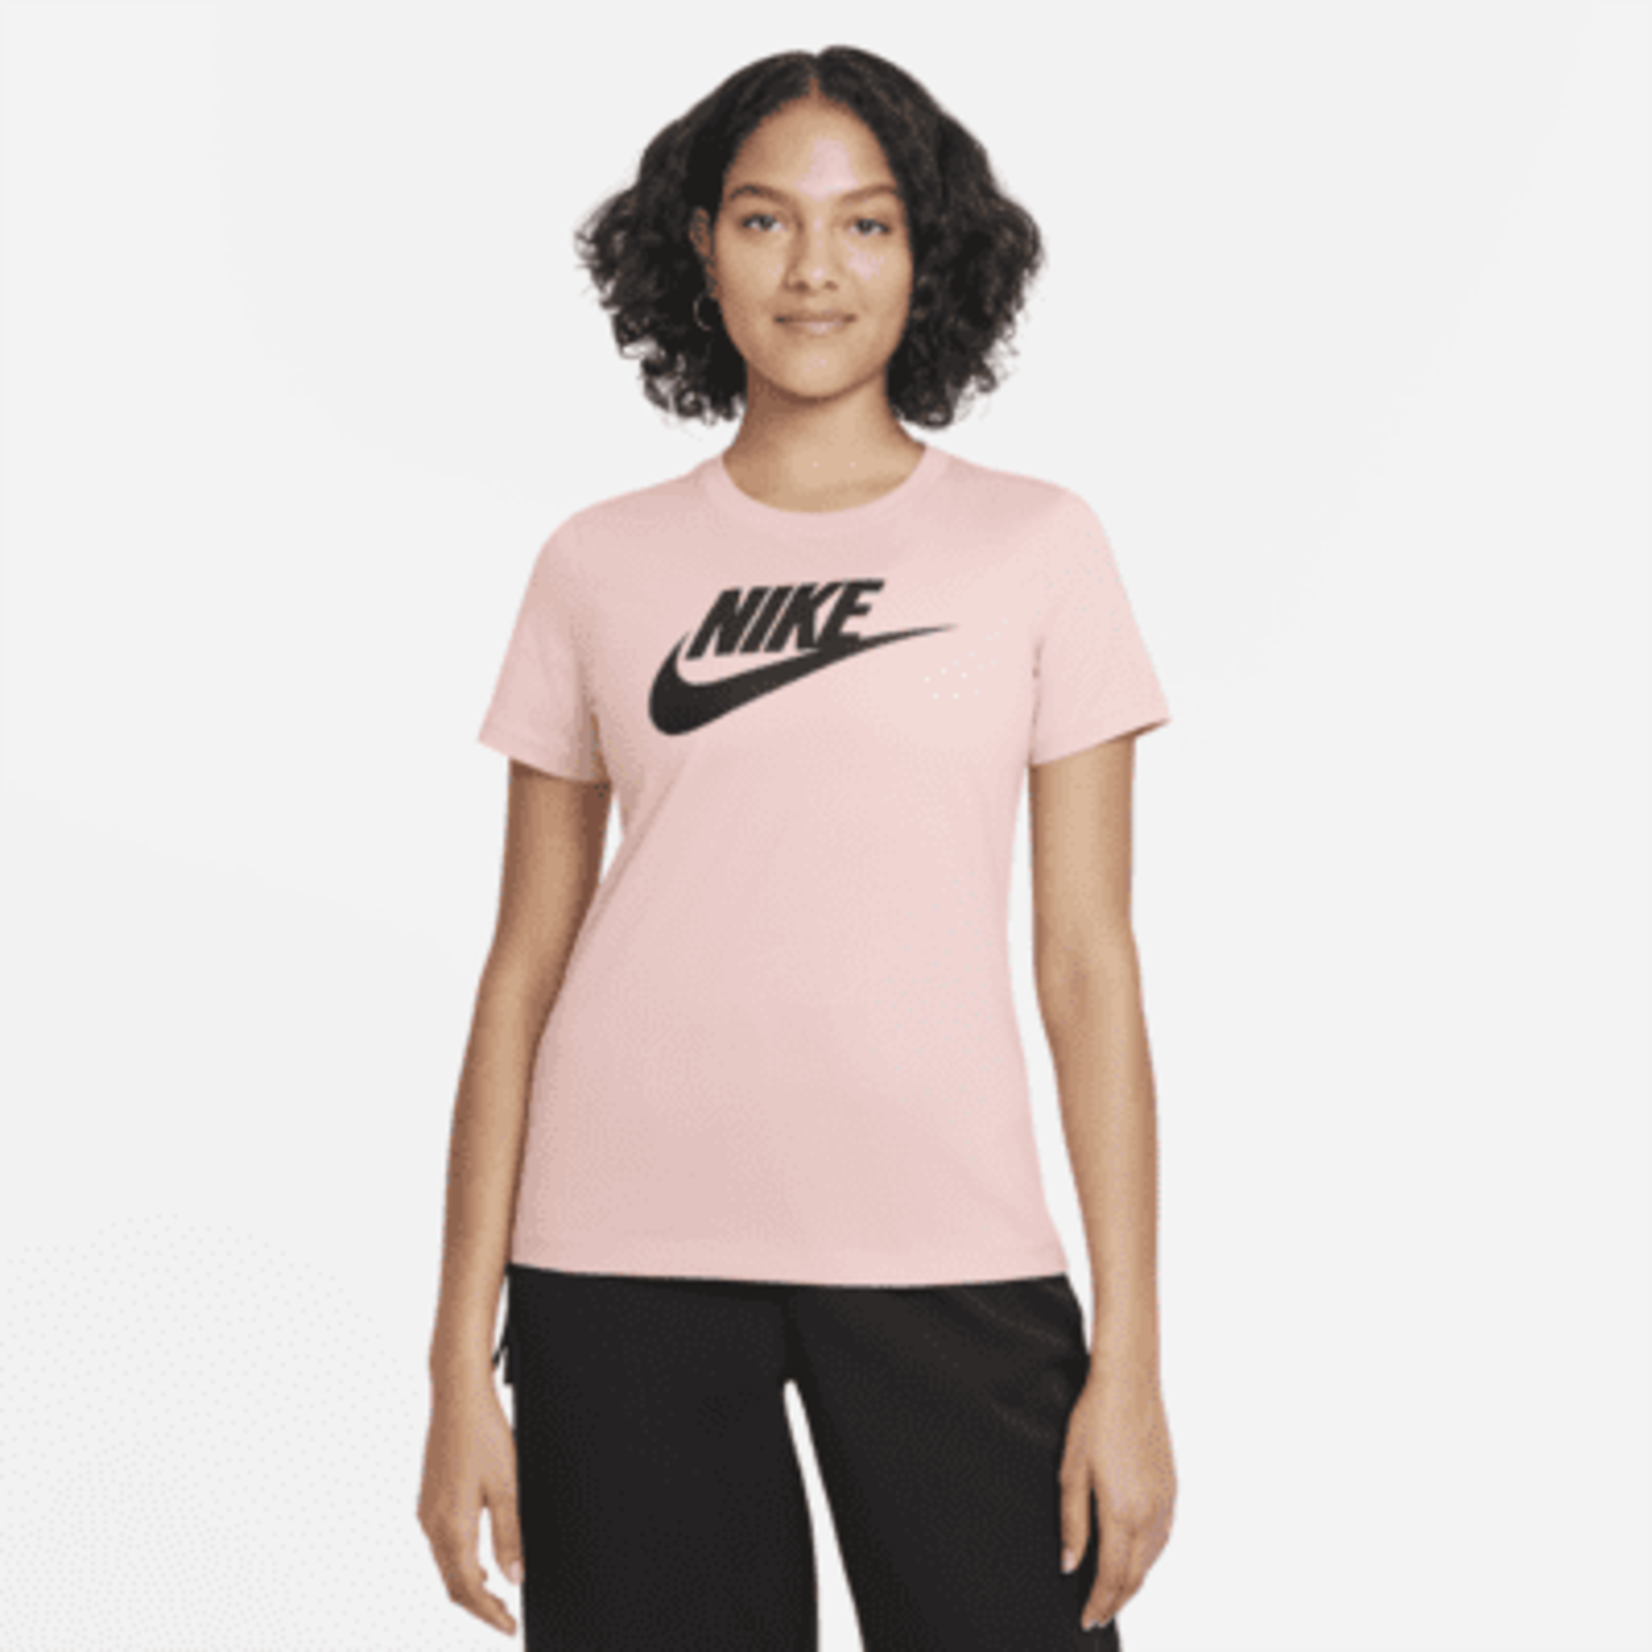 Nike Nike T-Shirt, Sportswear Tee Essential Icon Futura, Ladies